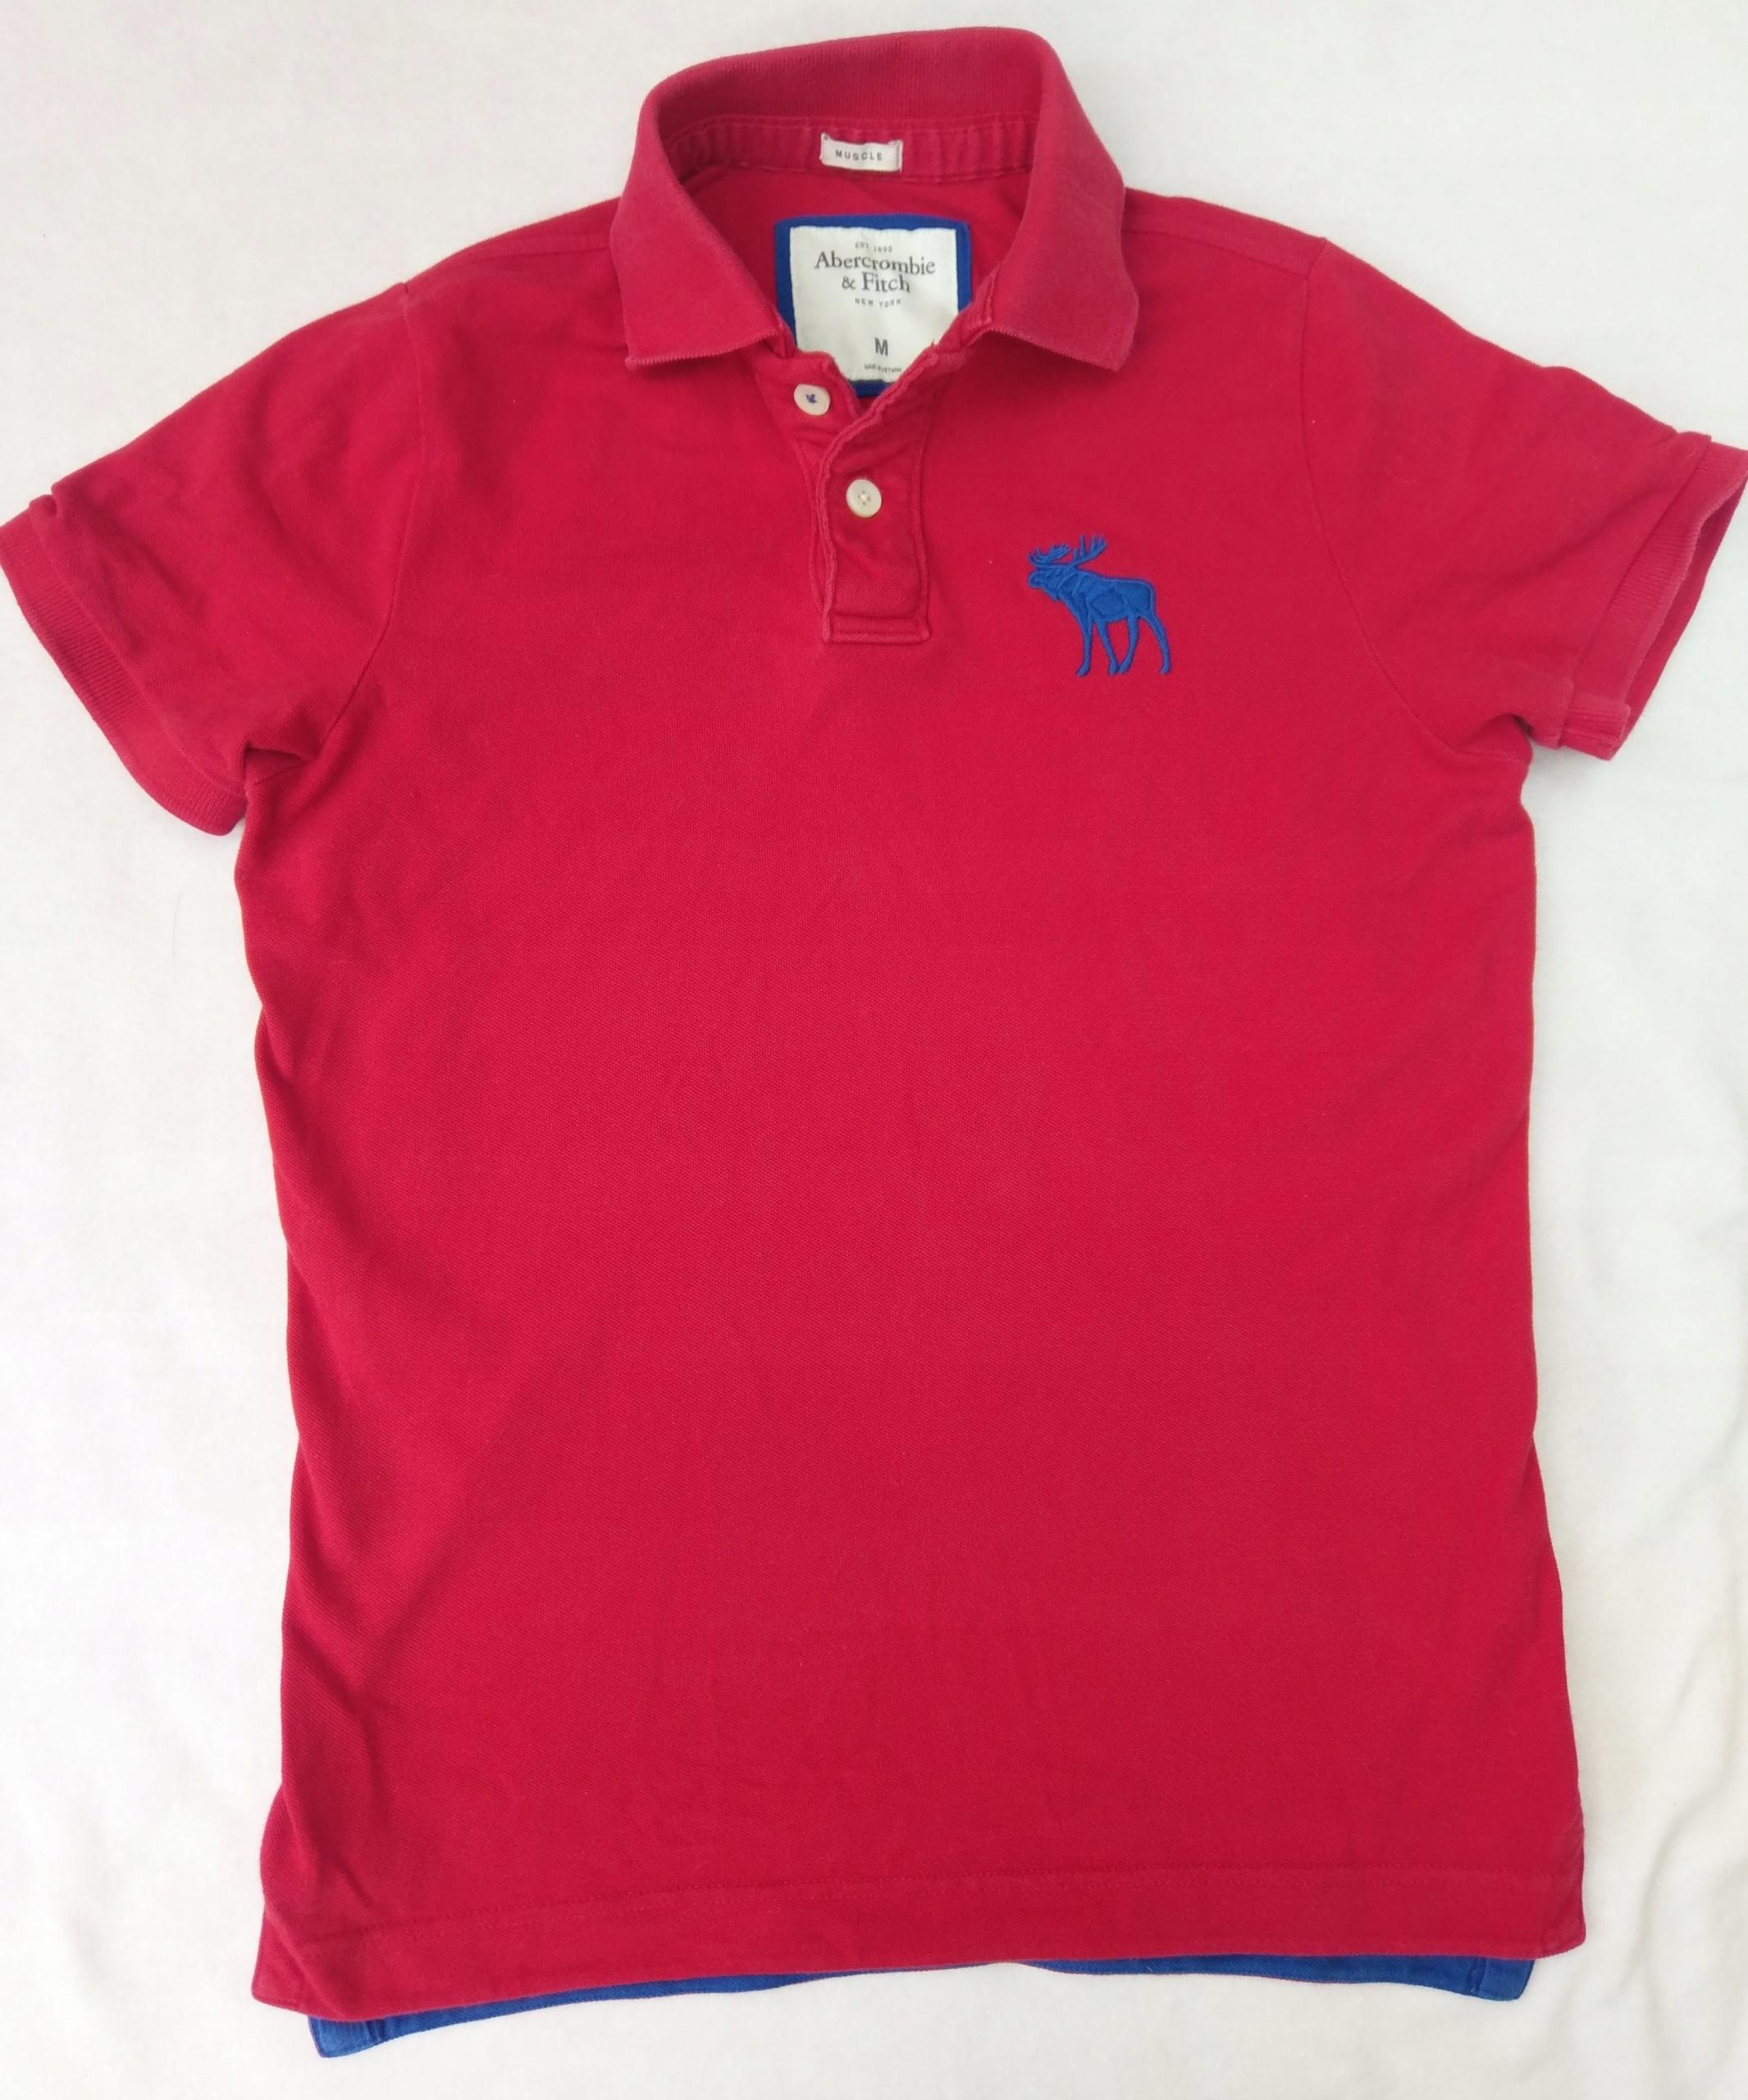 Koszulka polo Abercrombie & Fitch - Muscle